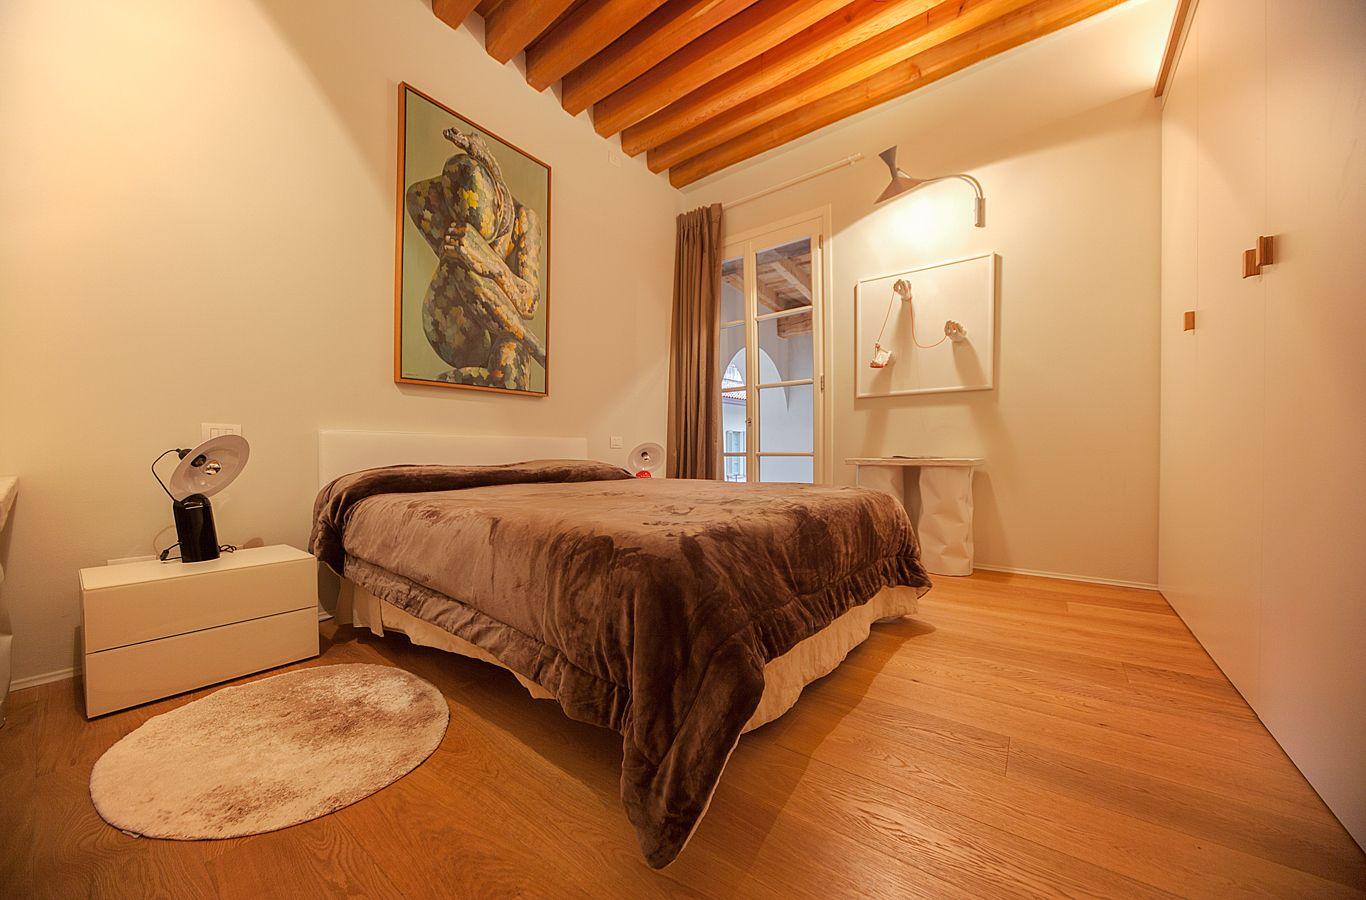 Casa Brac-Marseille - image 7